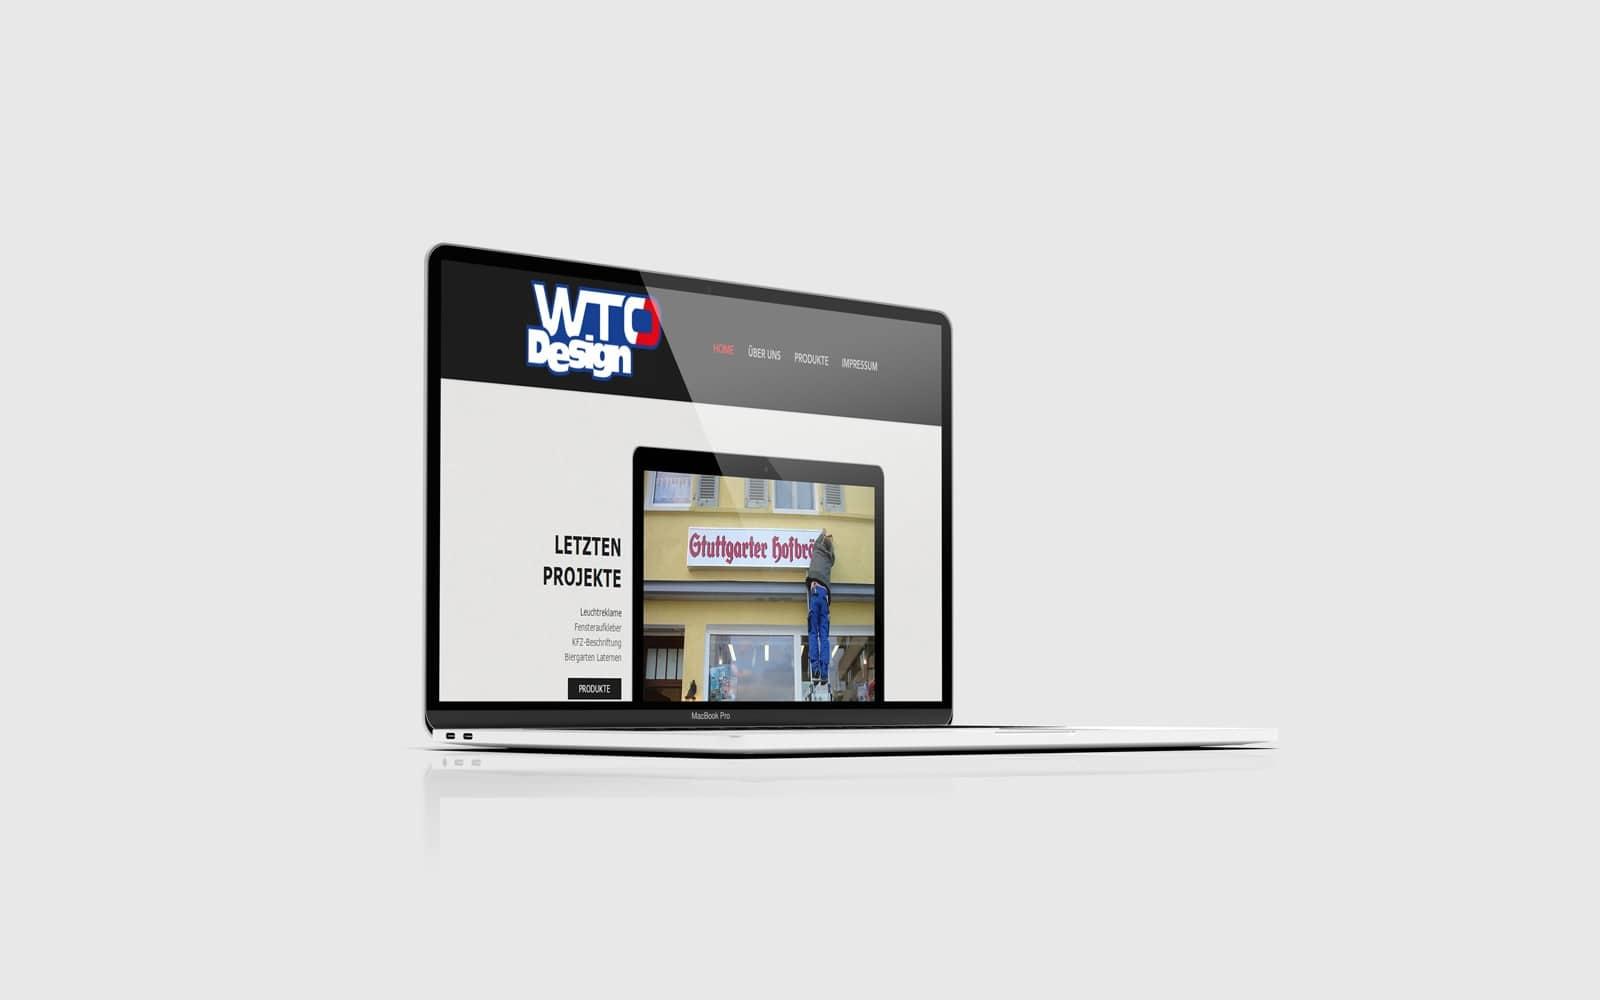 agentur-liebespixel-WTO-Design-Kirchheim-Mediengestaltung-webdesign